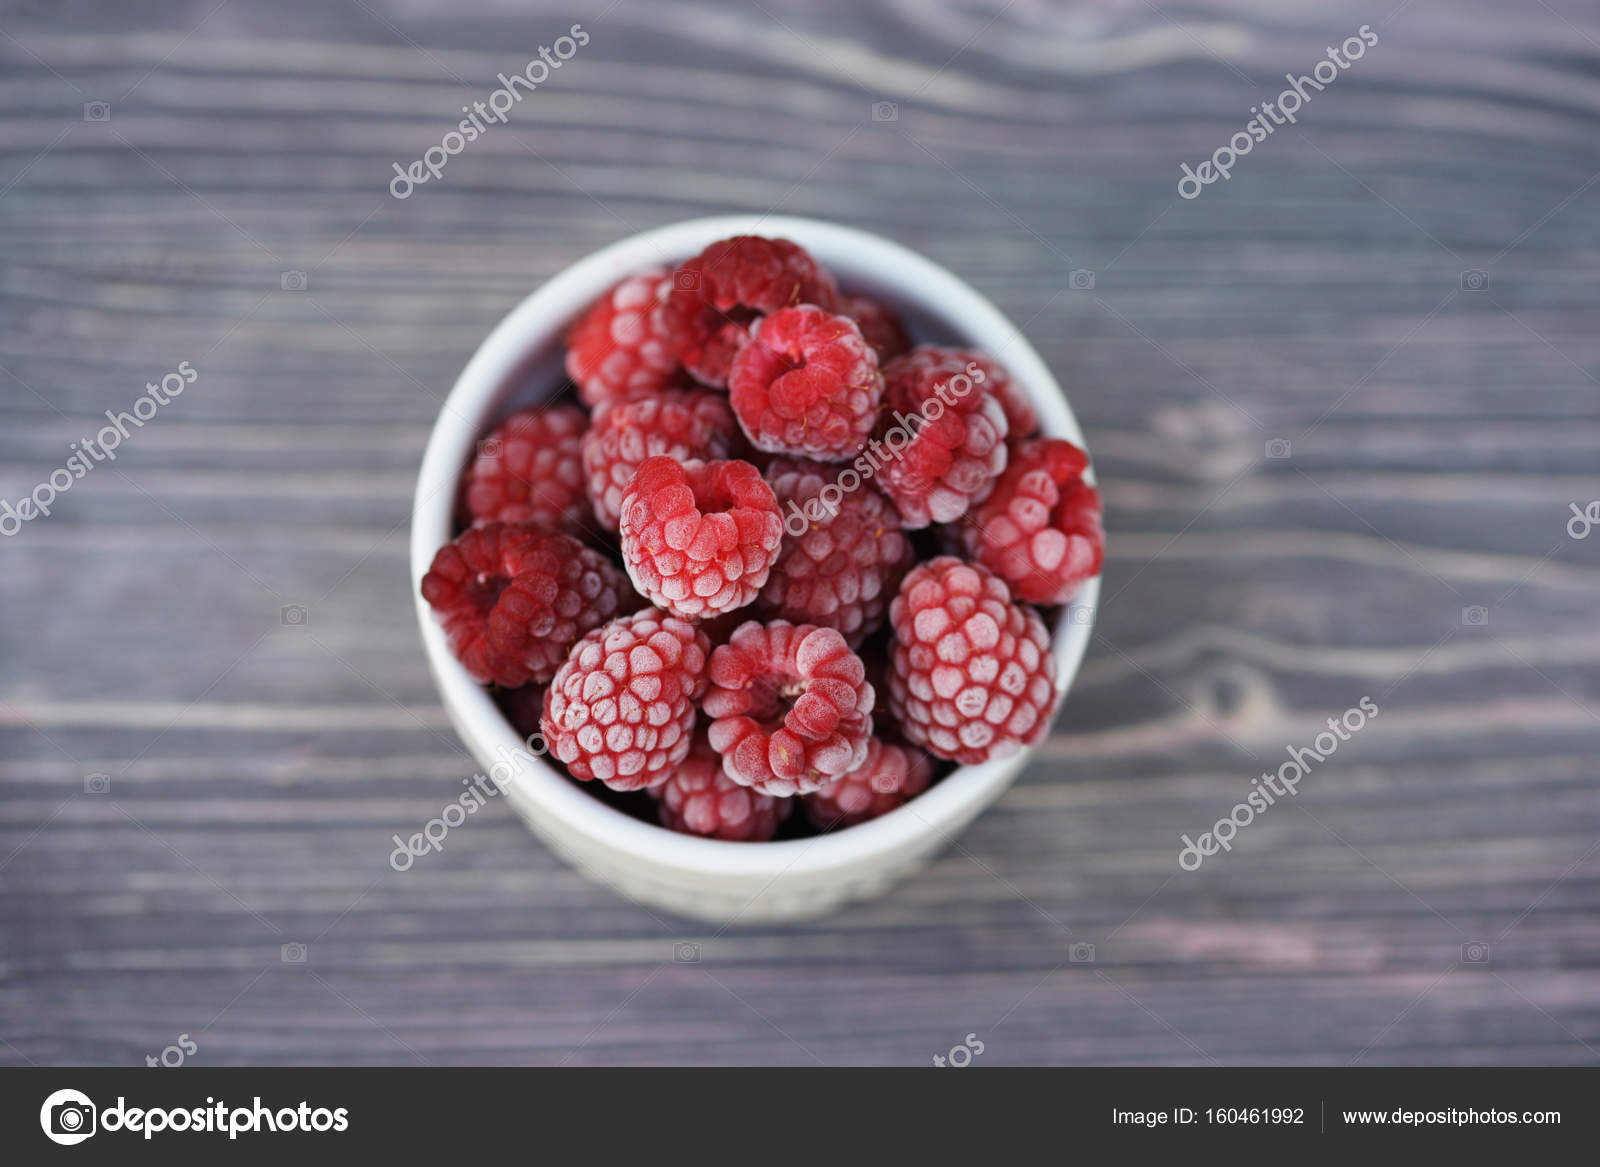 gel e de framboise berry avec givre blanc photographie oliveshadow 160461992. Black Bedroom Furniture Sets. Home Design Ideas